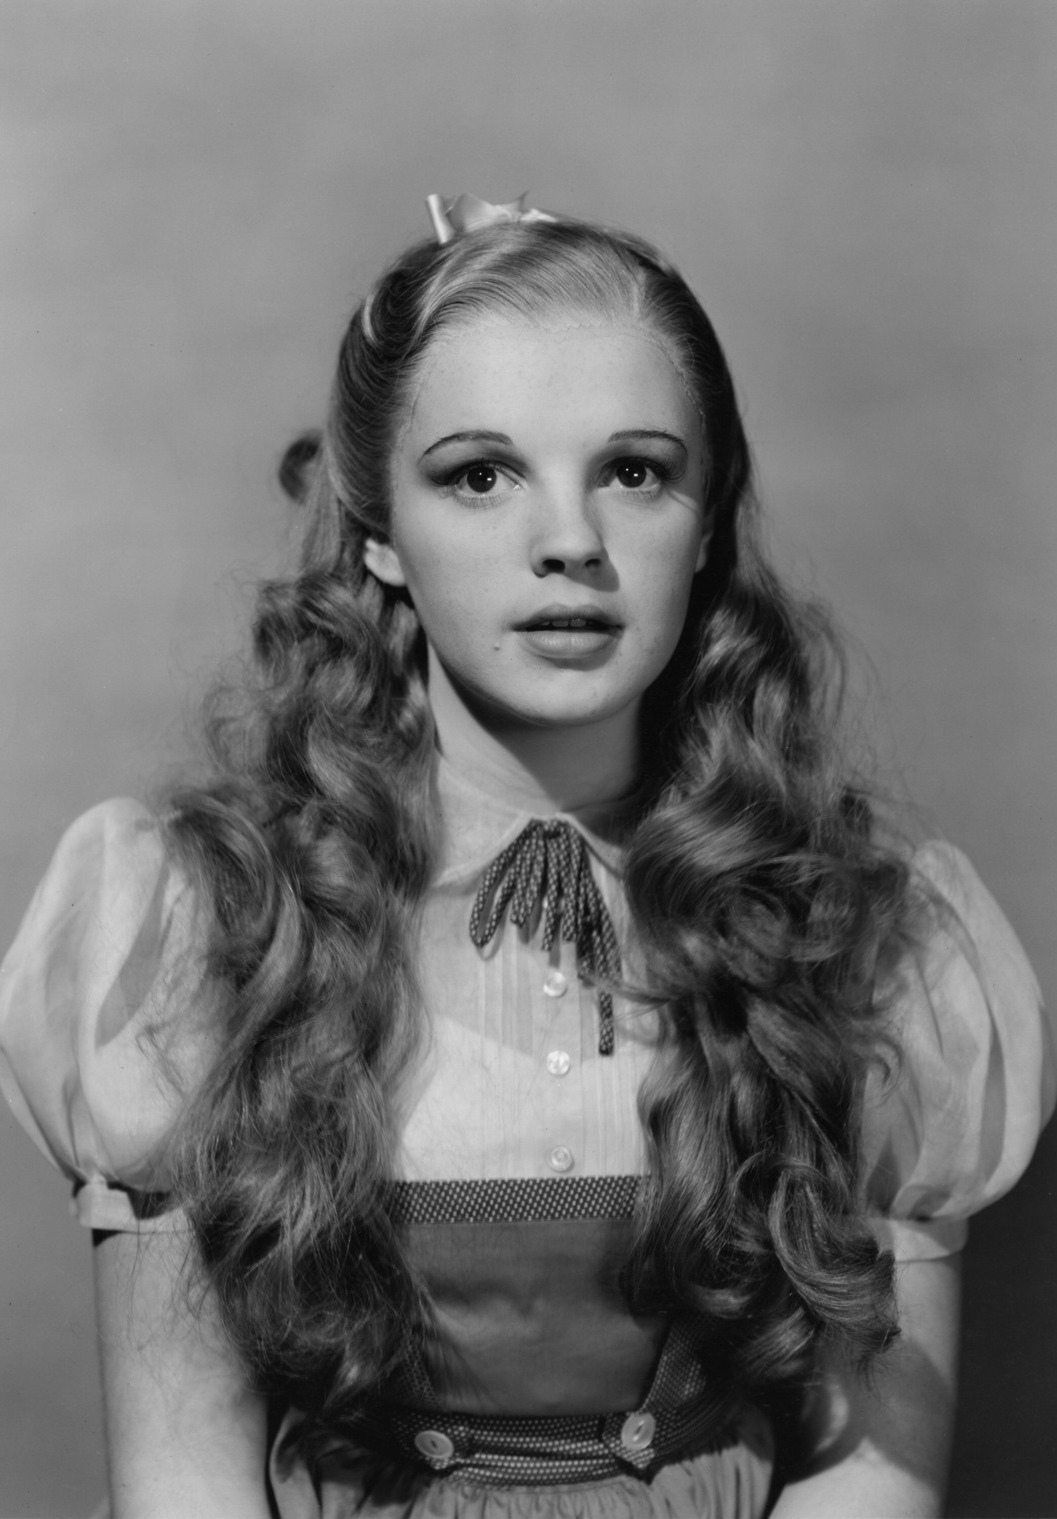 sMatuRQ The Tragic Life And Death Of Judy Garland